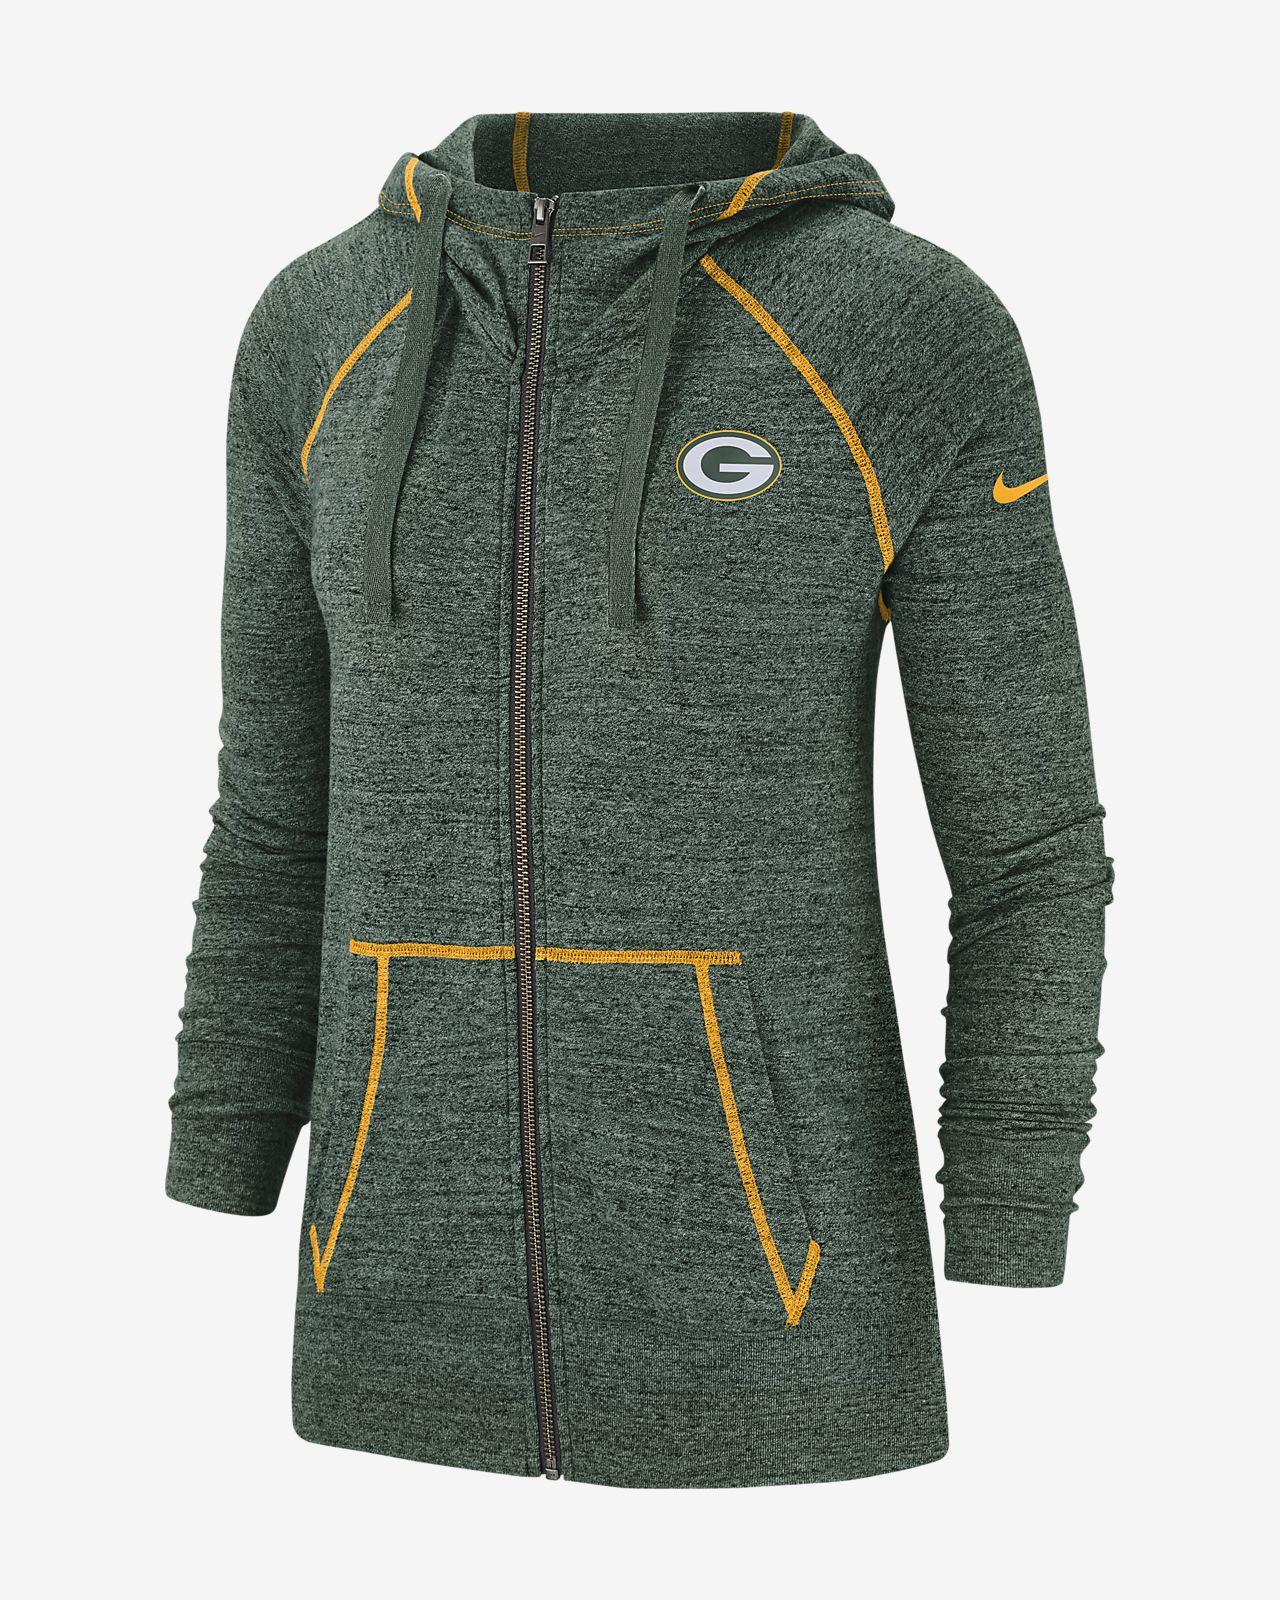 new styles d2556 a7e4b Nike Gym Vintage (NFL Packers) Women's Full-Zip Hoodie